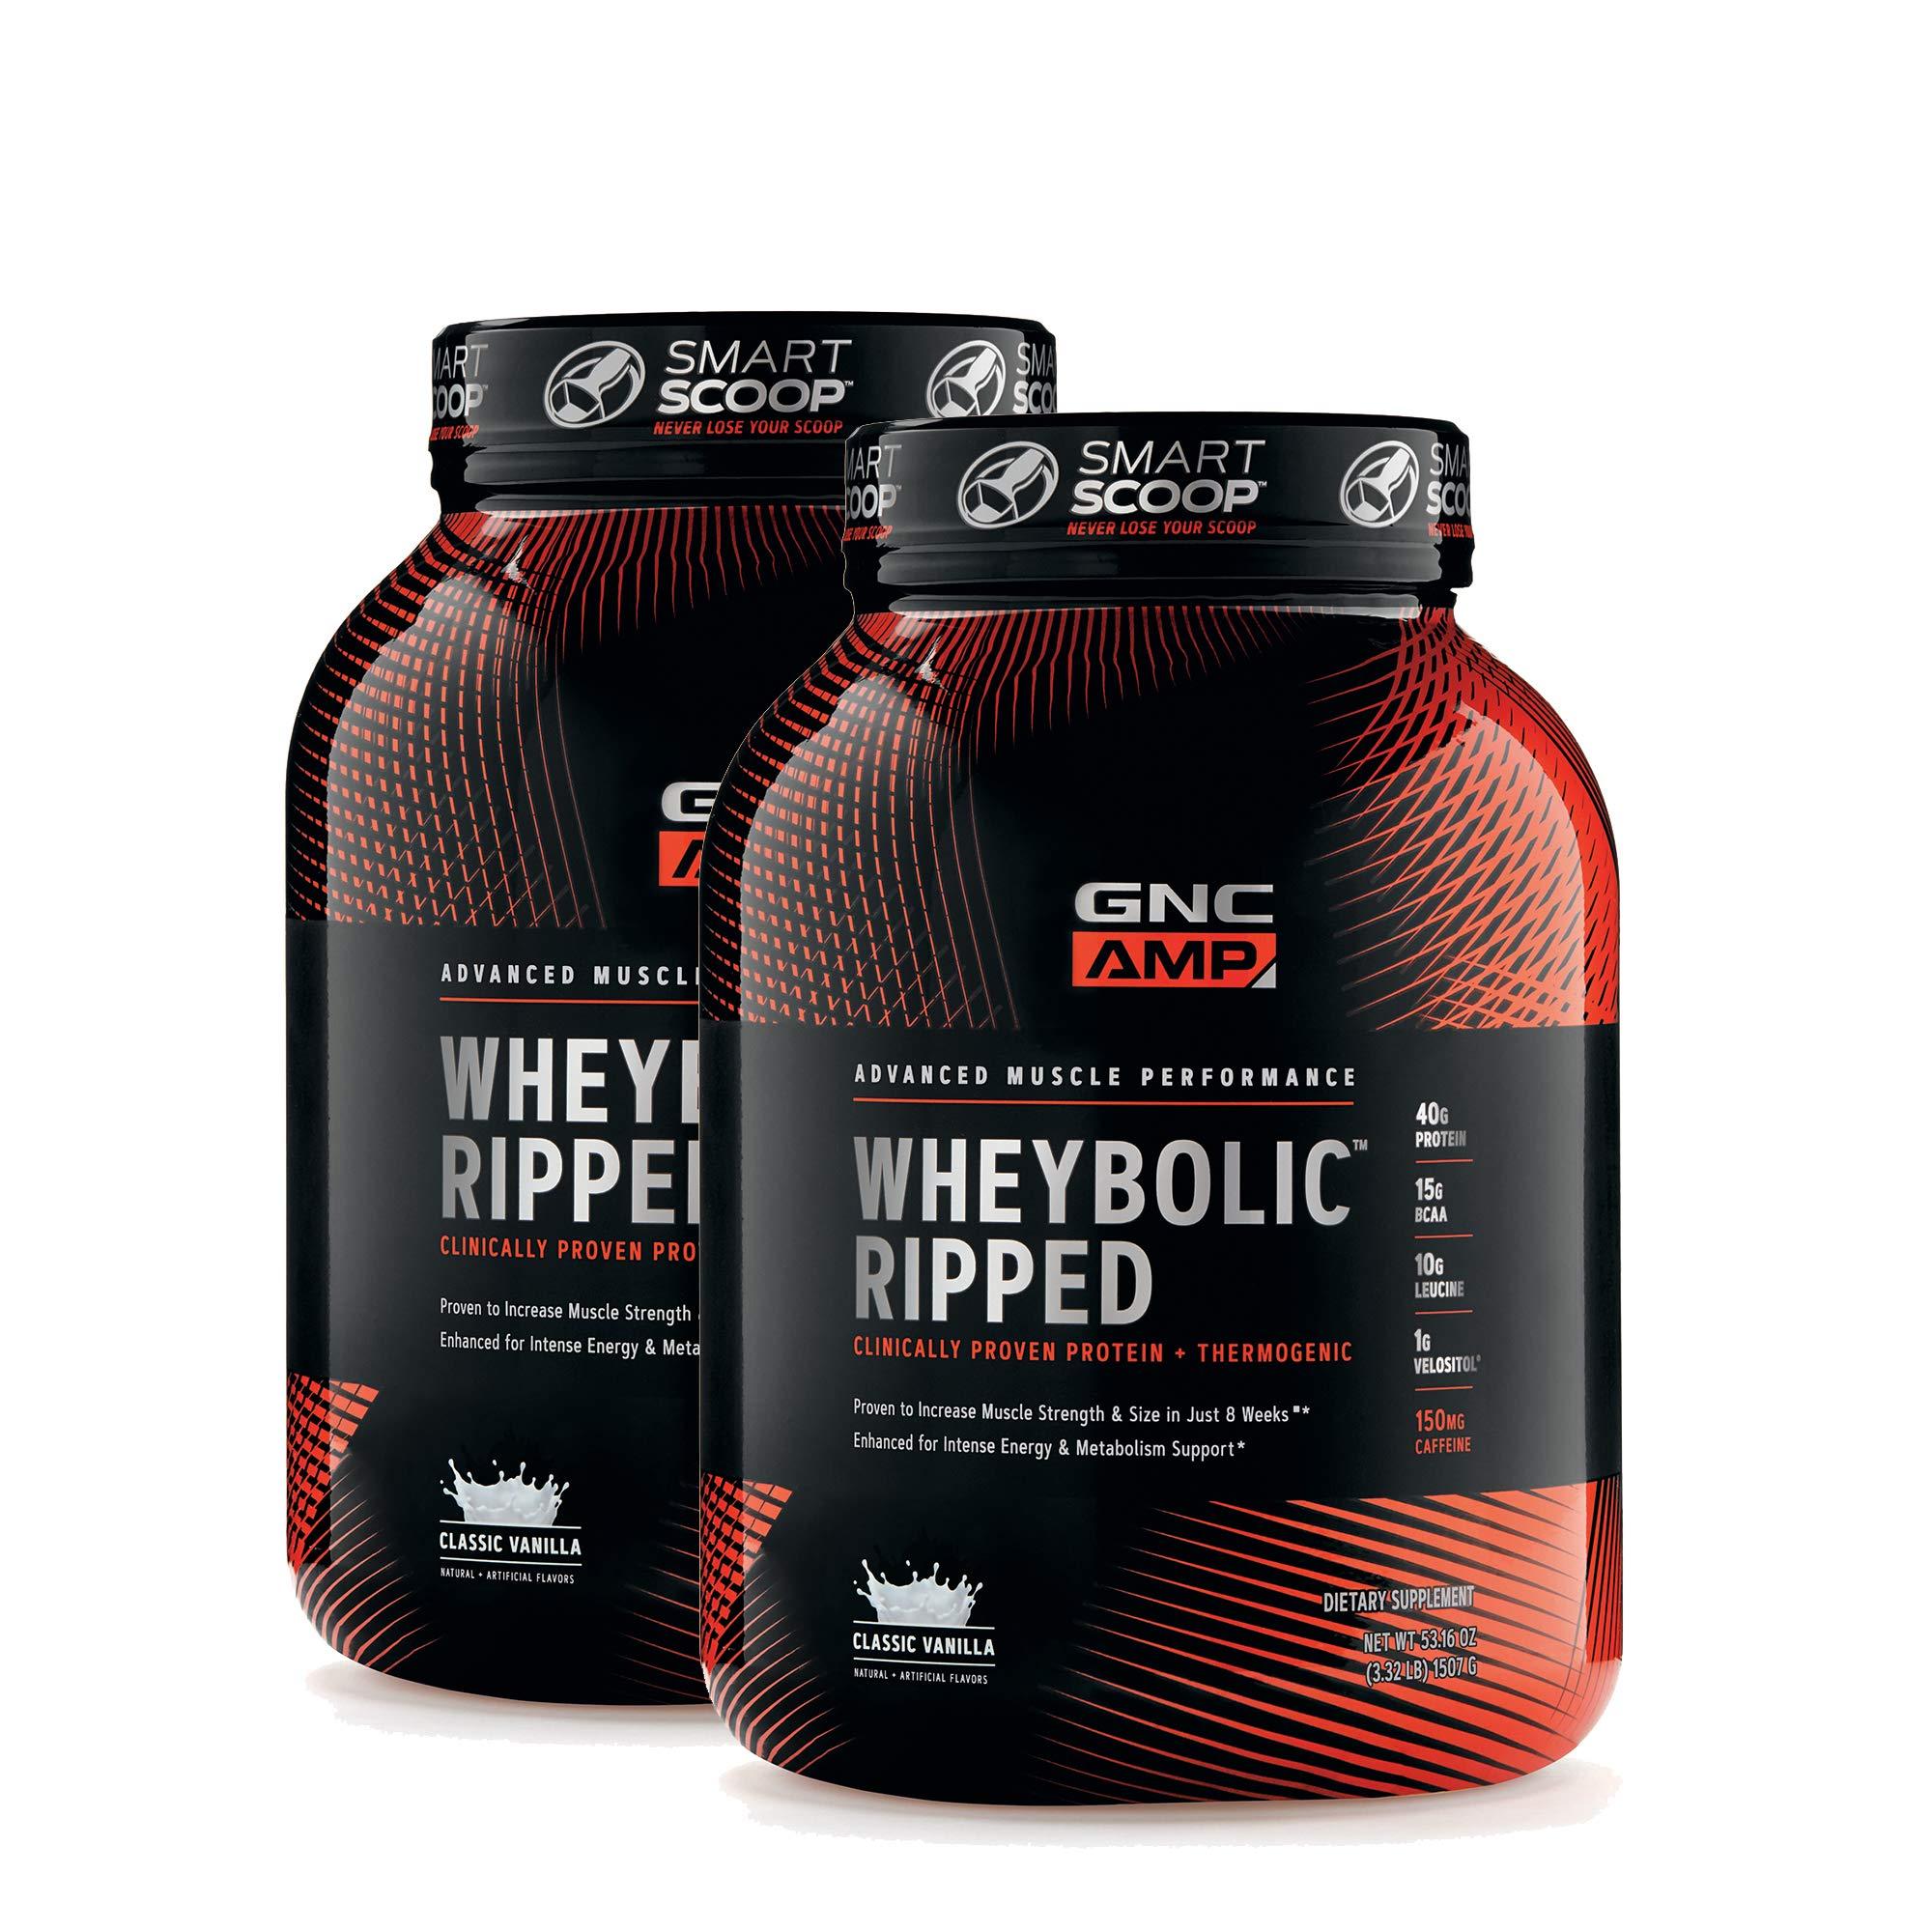 GNC AMP Wheybolic Ripped - Classic Vanilla - Twin Pack